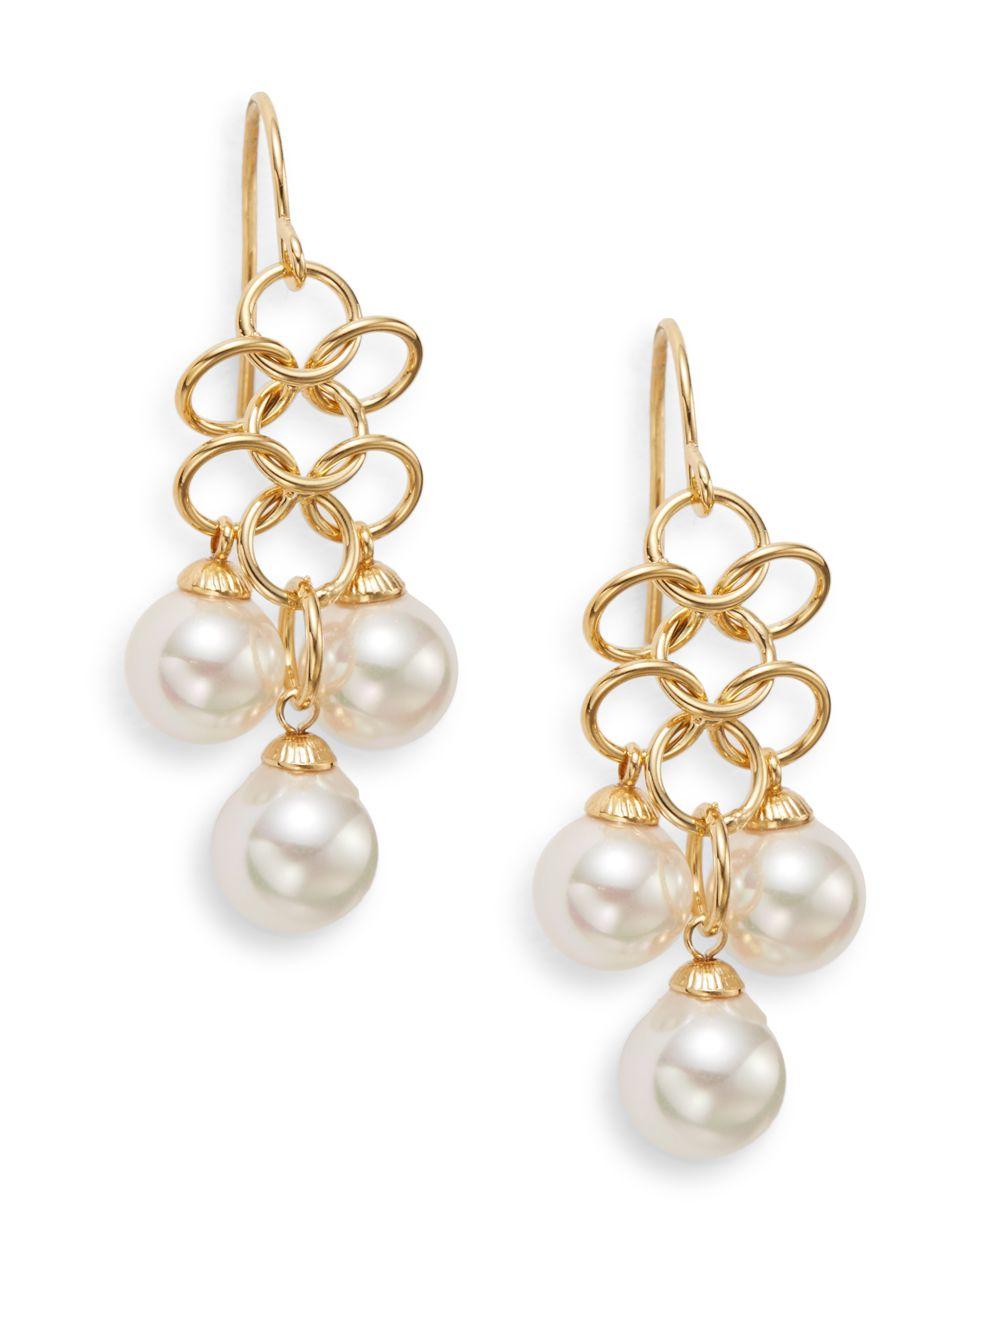 7mm pearl earrings : Majorica mm white pearl mesh drop earrings in